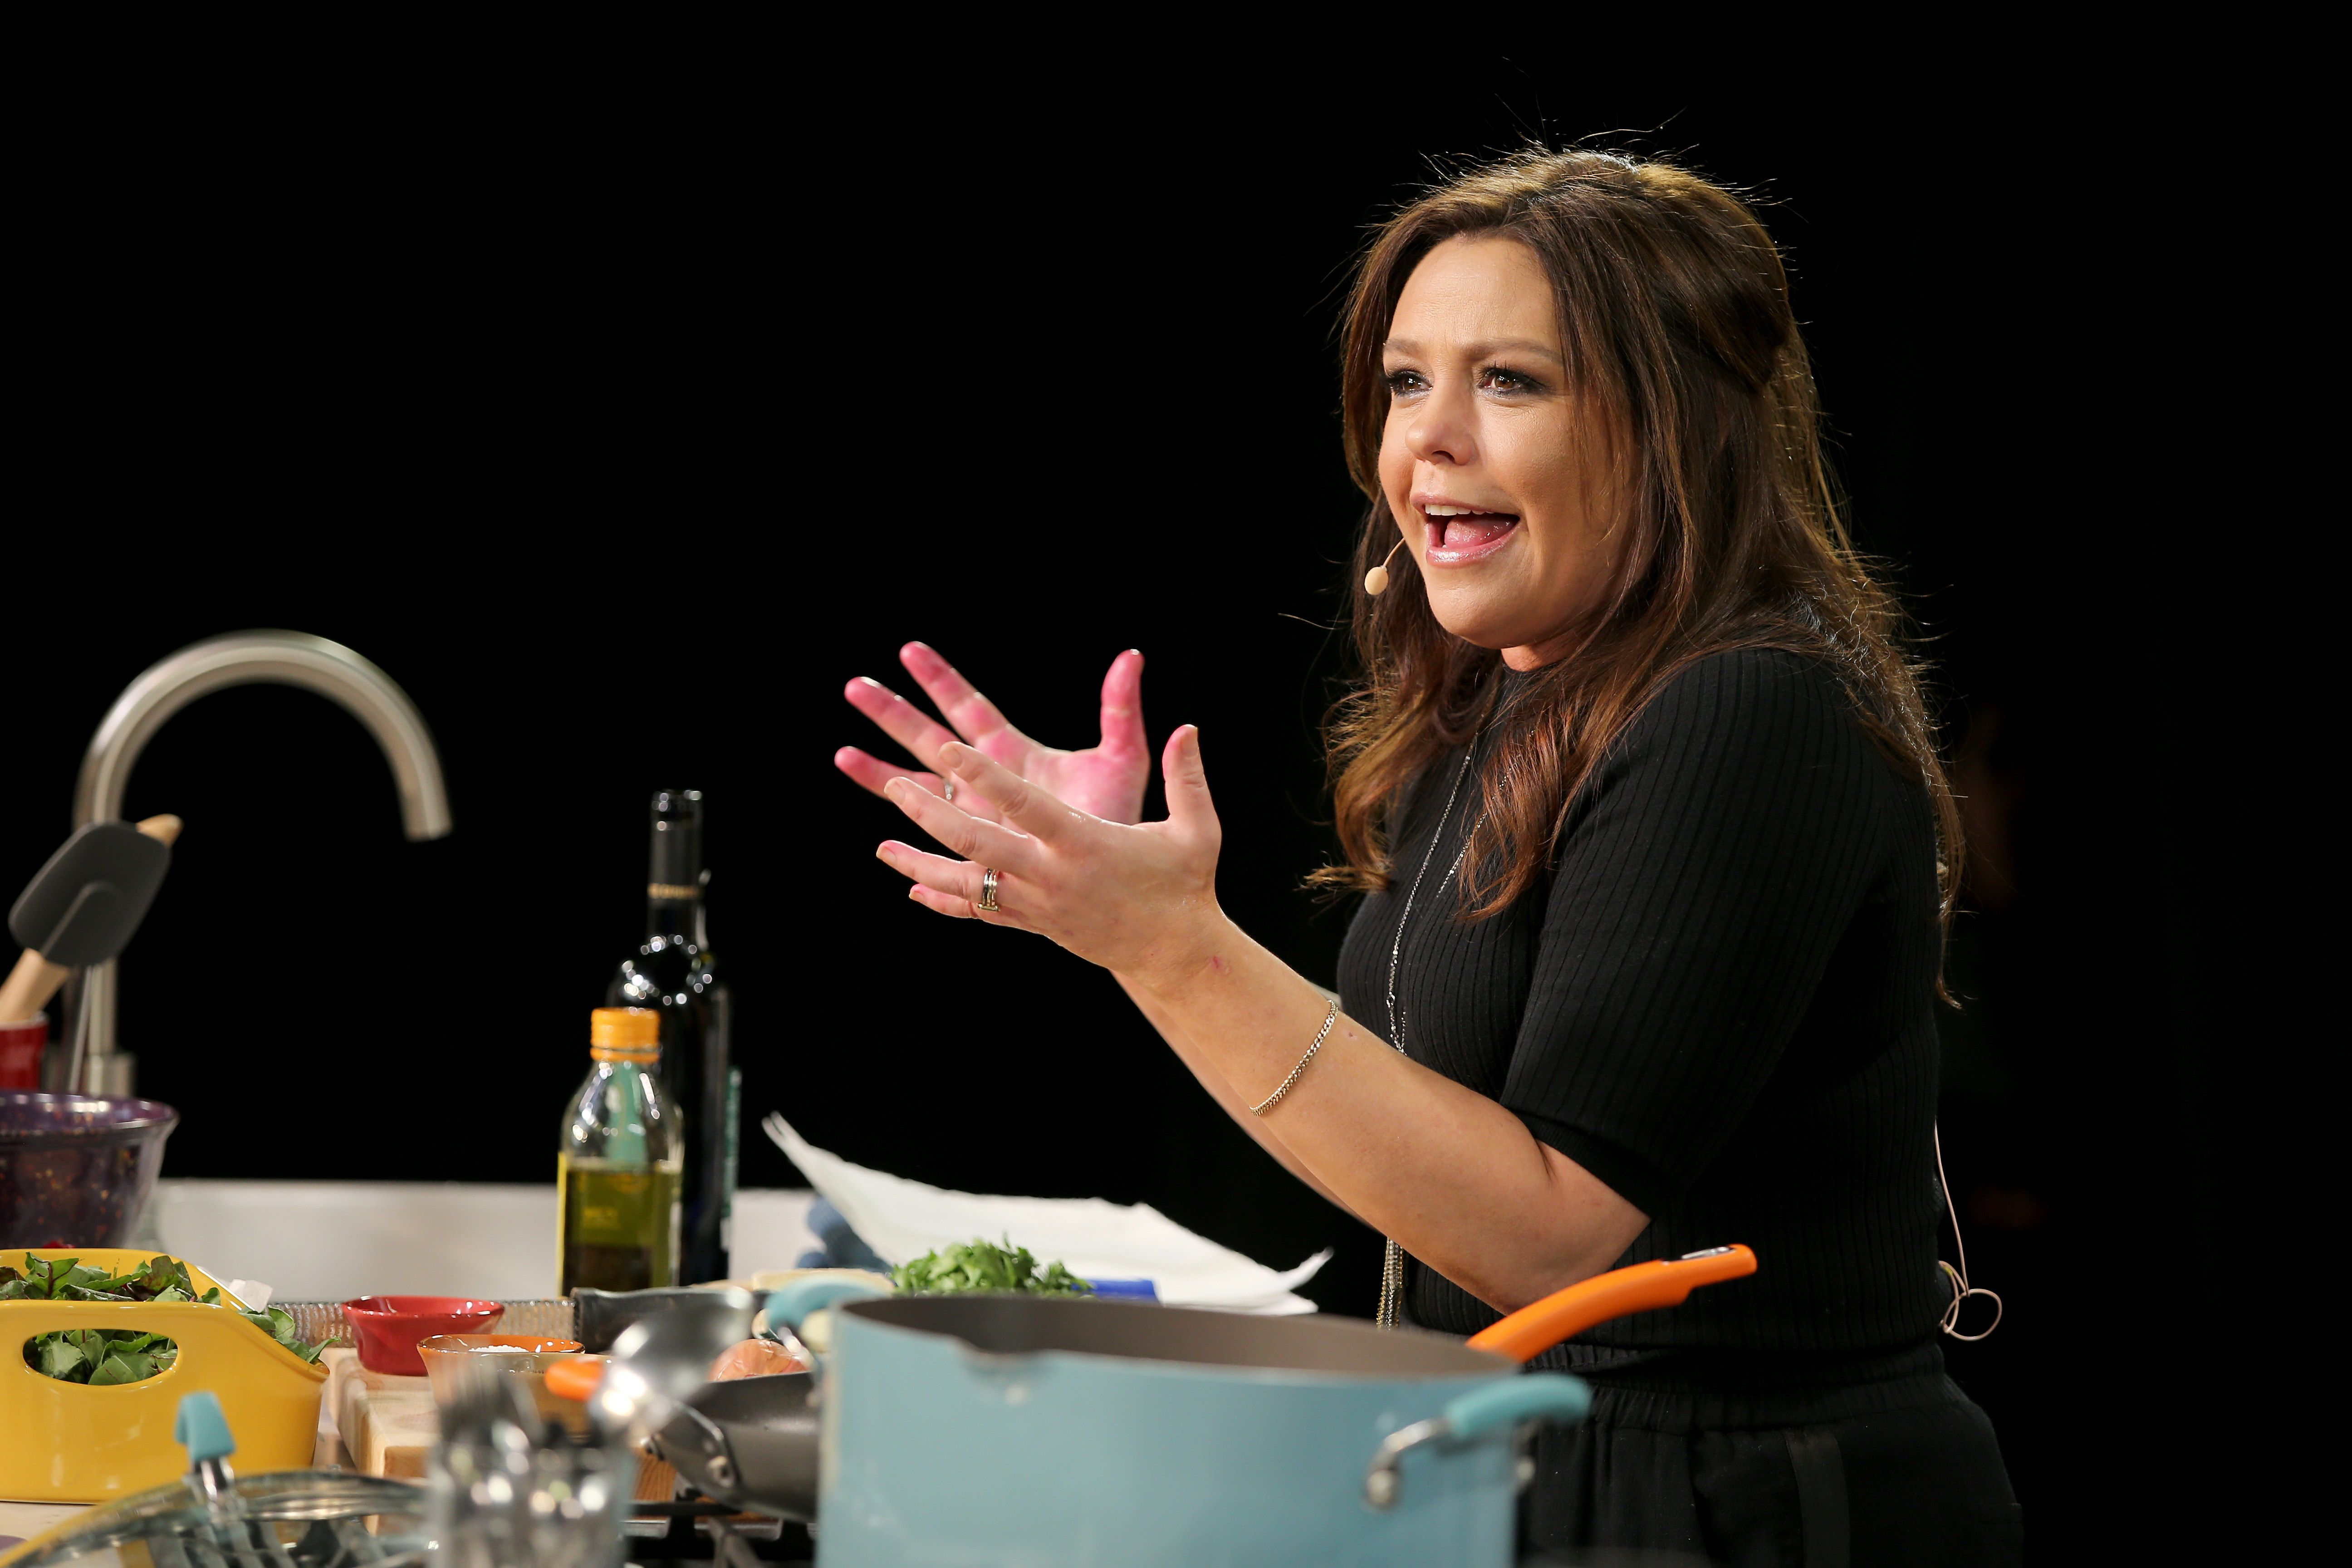 Talk show host Rachael Ray